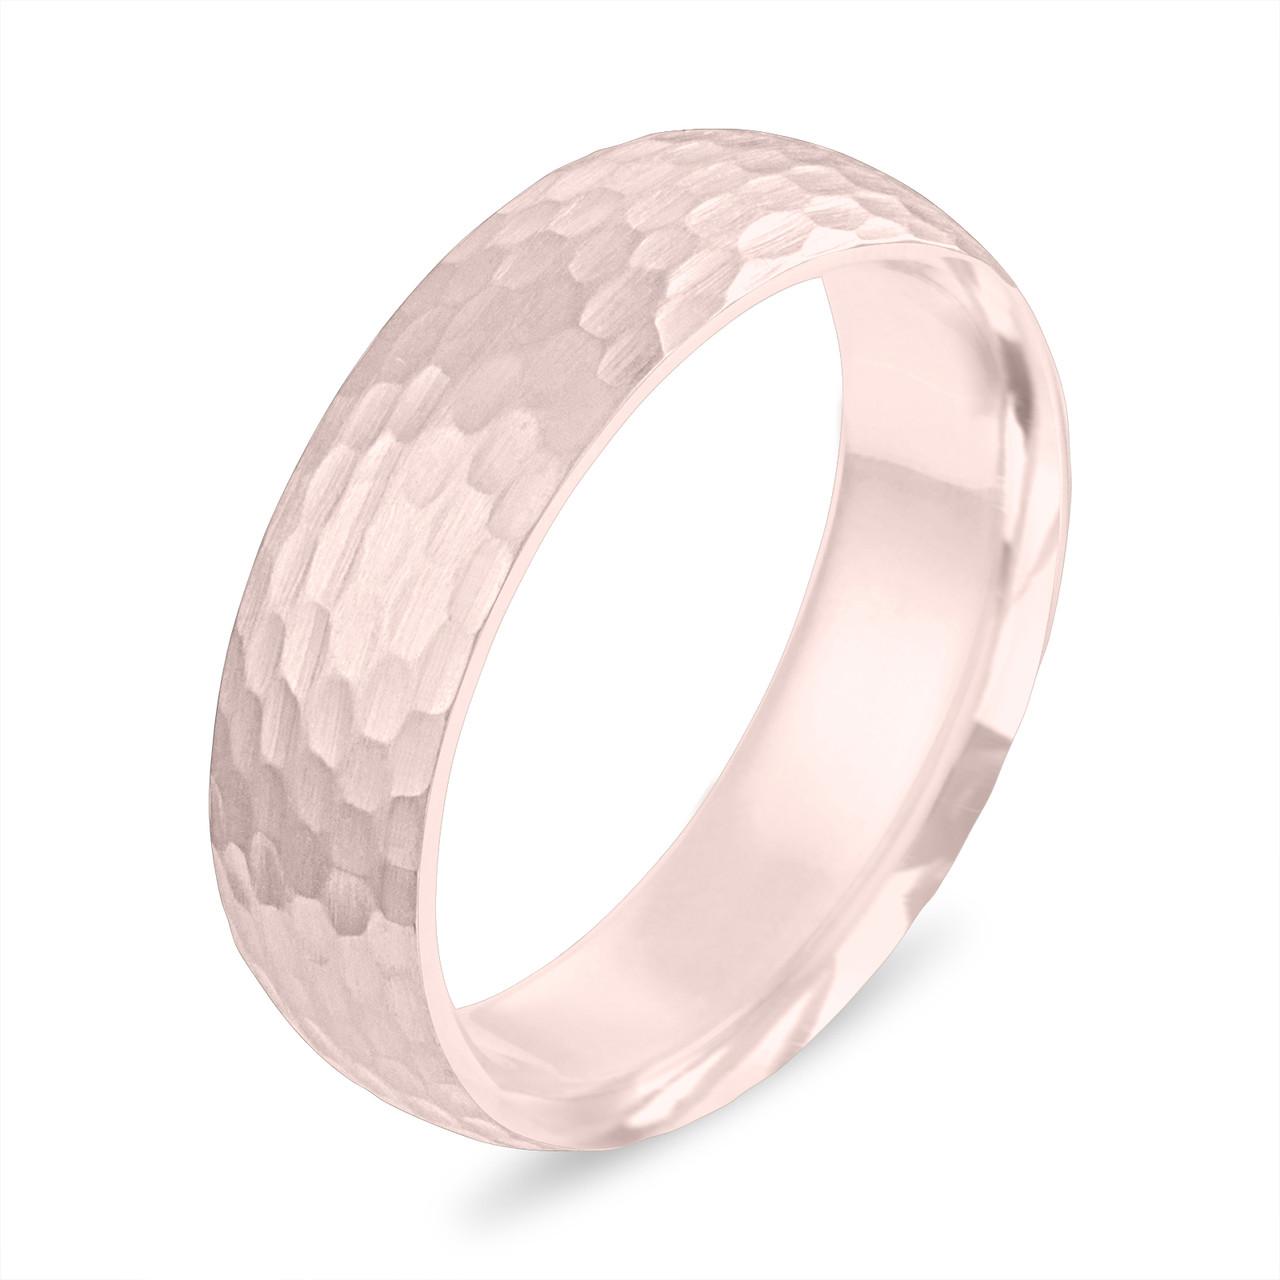 Hammered Finish Wedding Band Mens Wedding Ring Rose Gold Womens